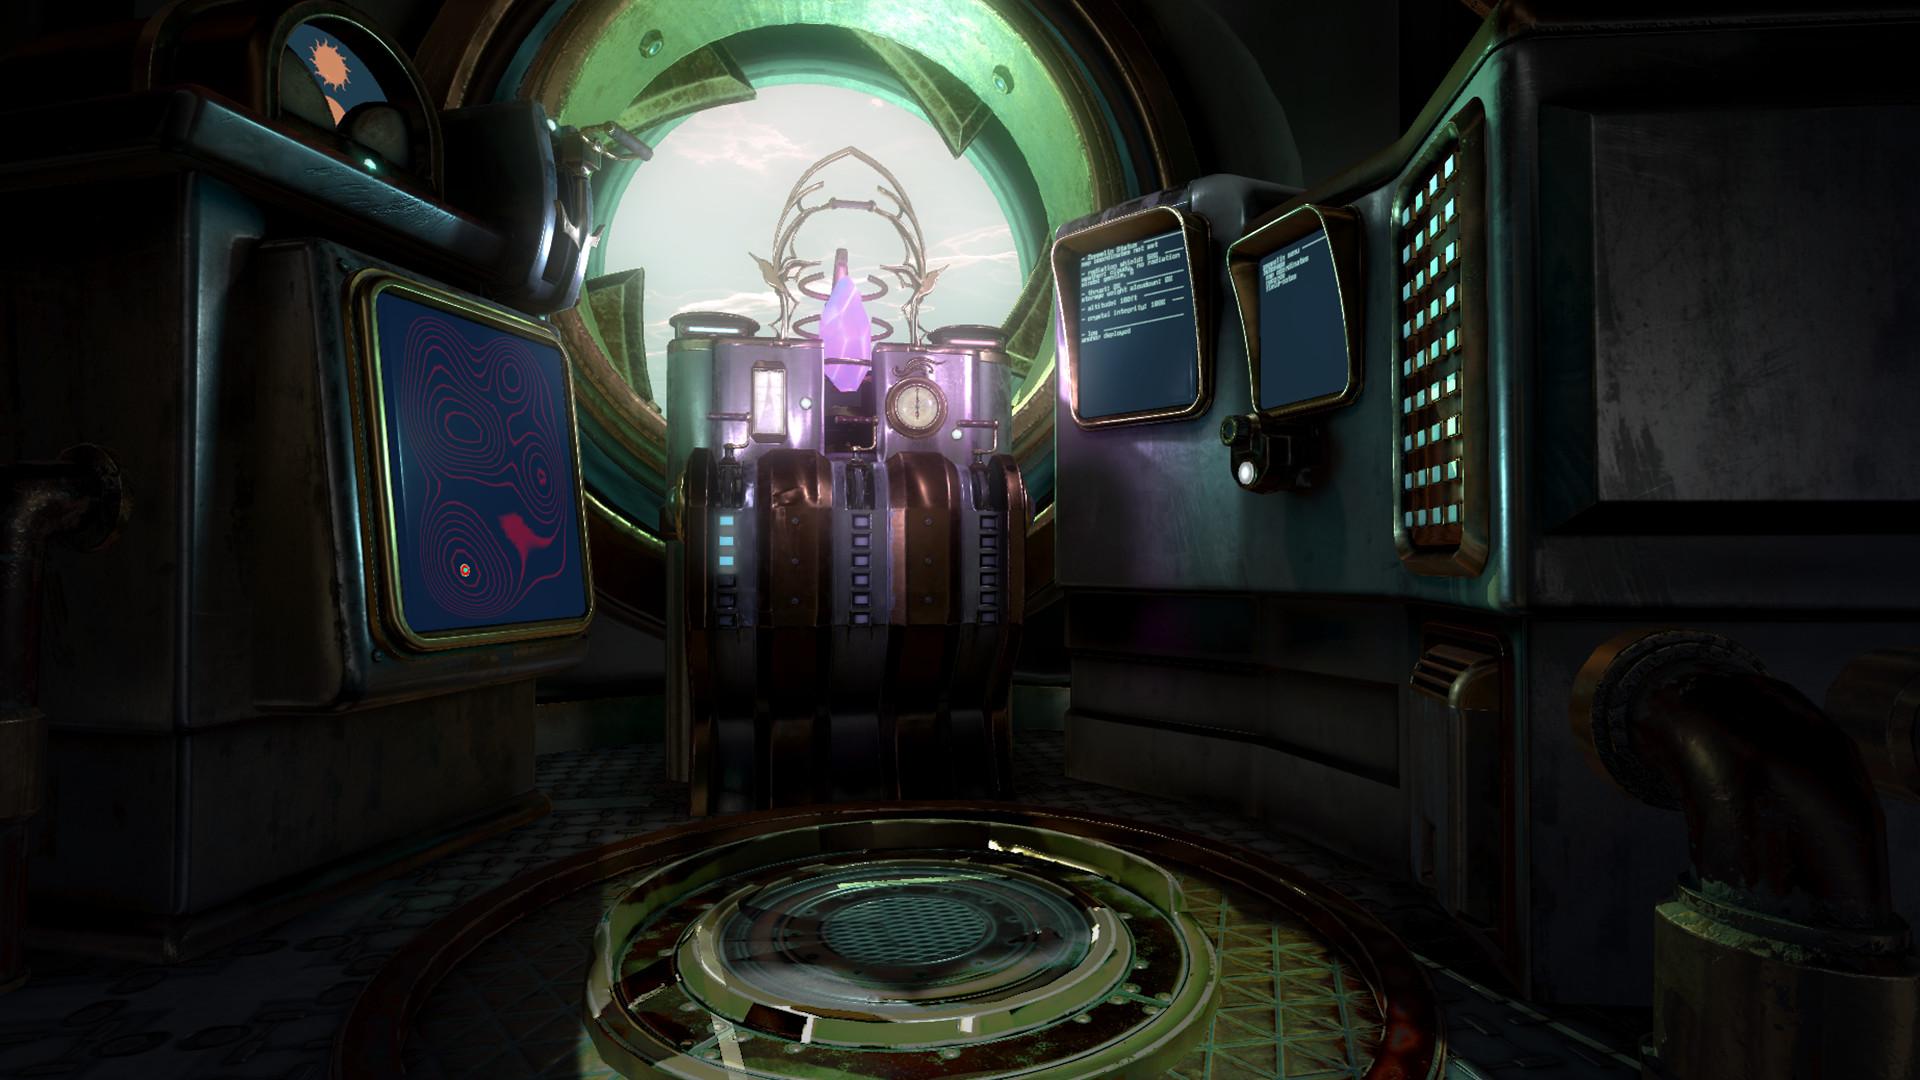 VR-Puzzlespiel A Rogue Escape mit Termin